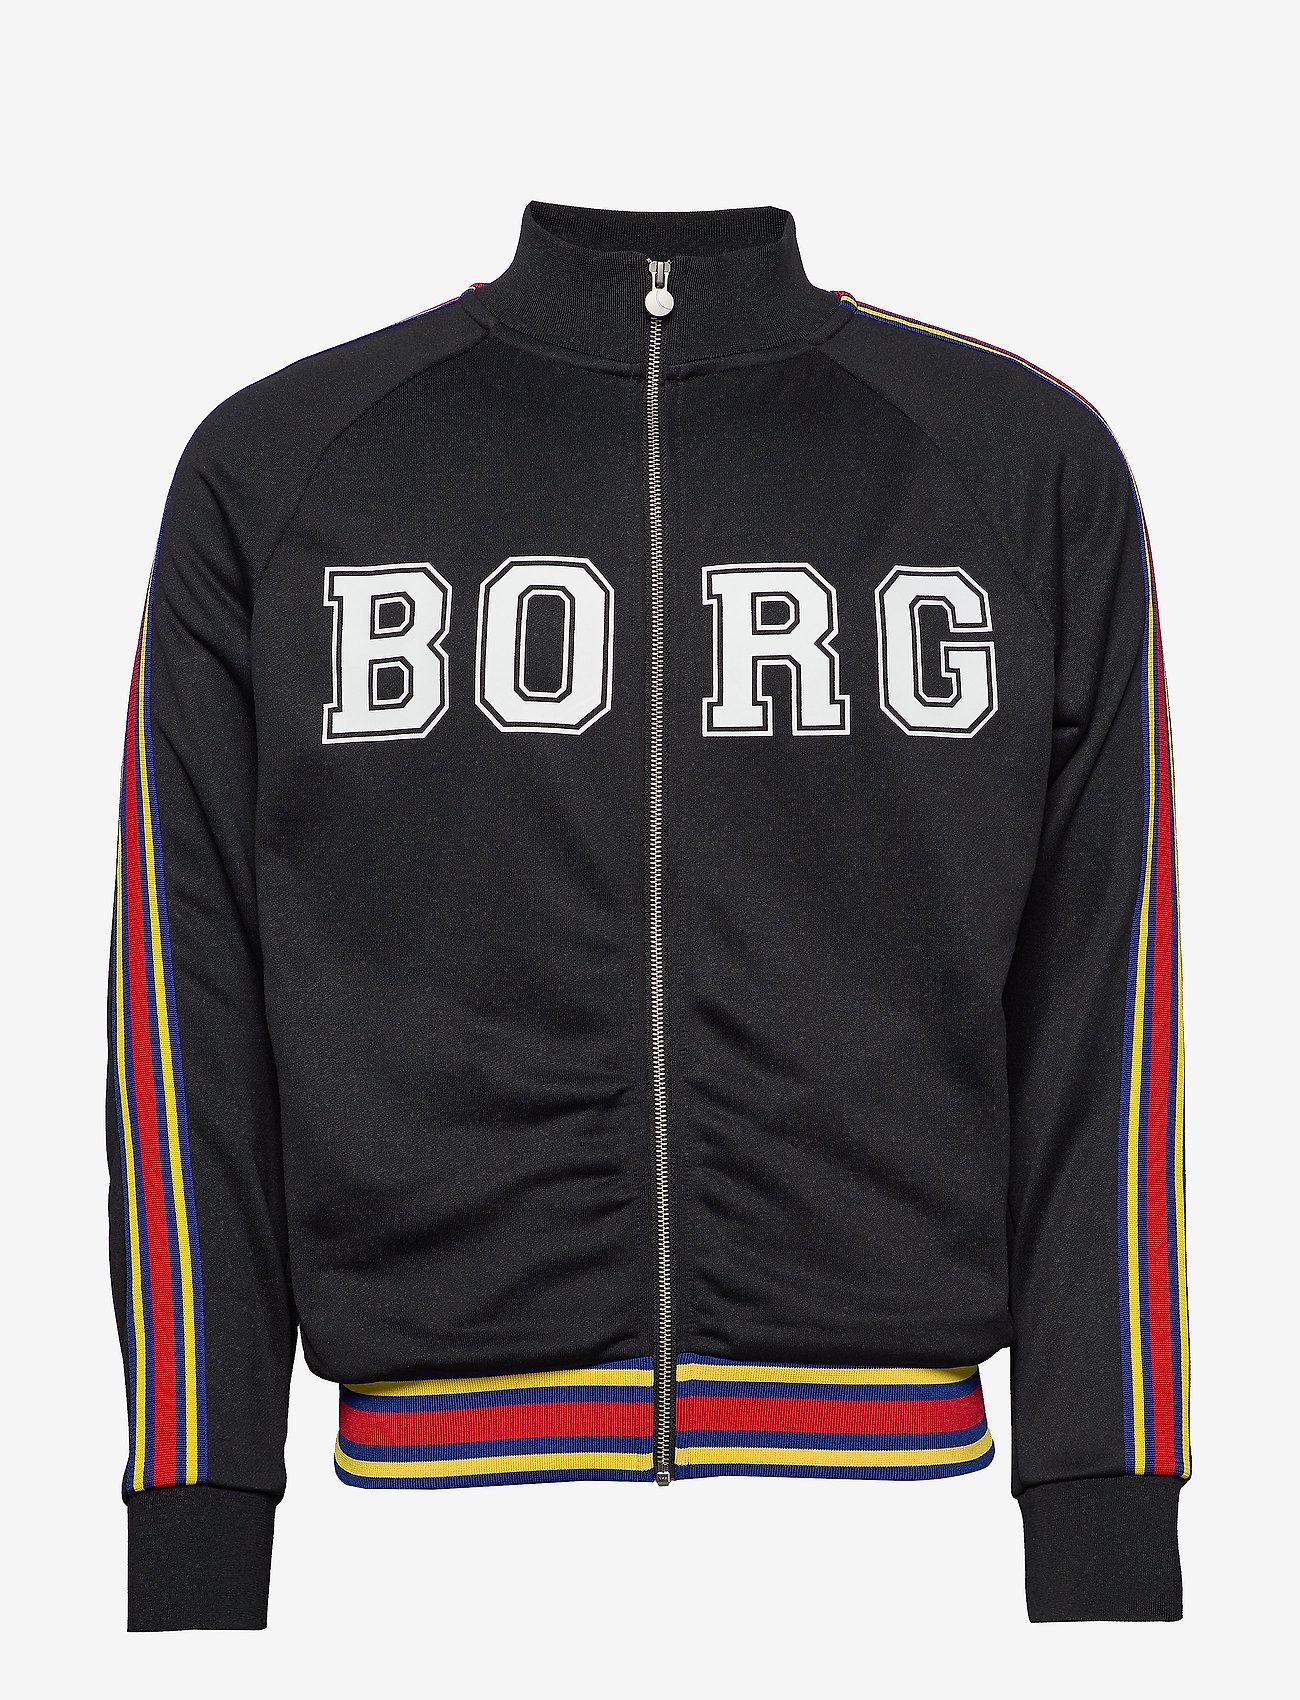 Björn Borg - TEAM BORG TRACK JACKET - track jackets - black beauty